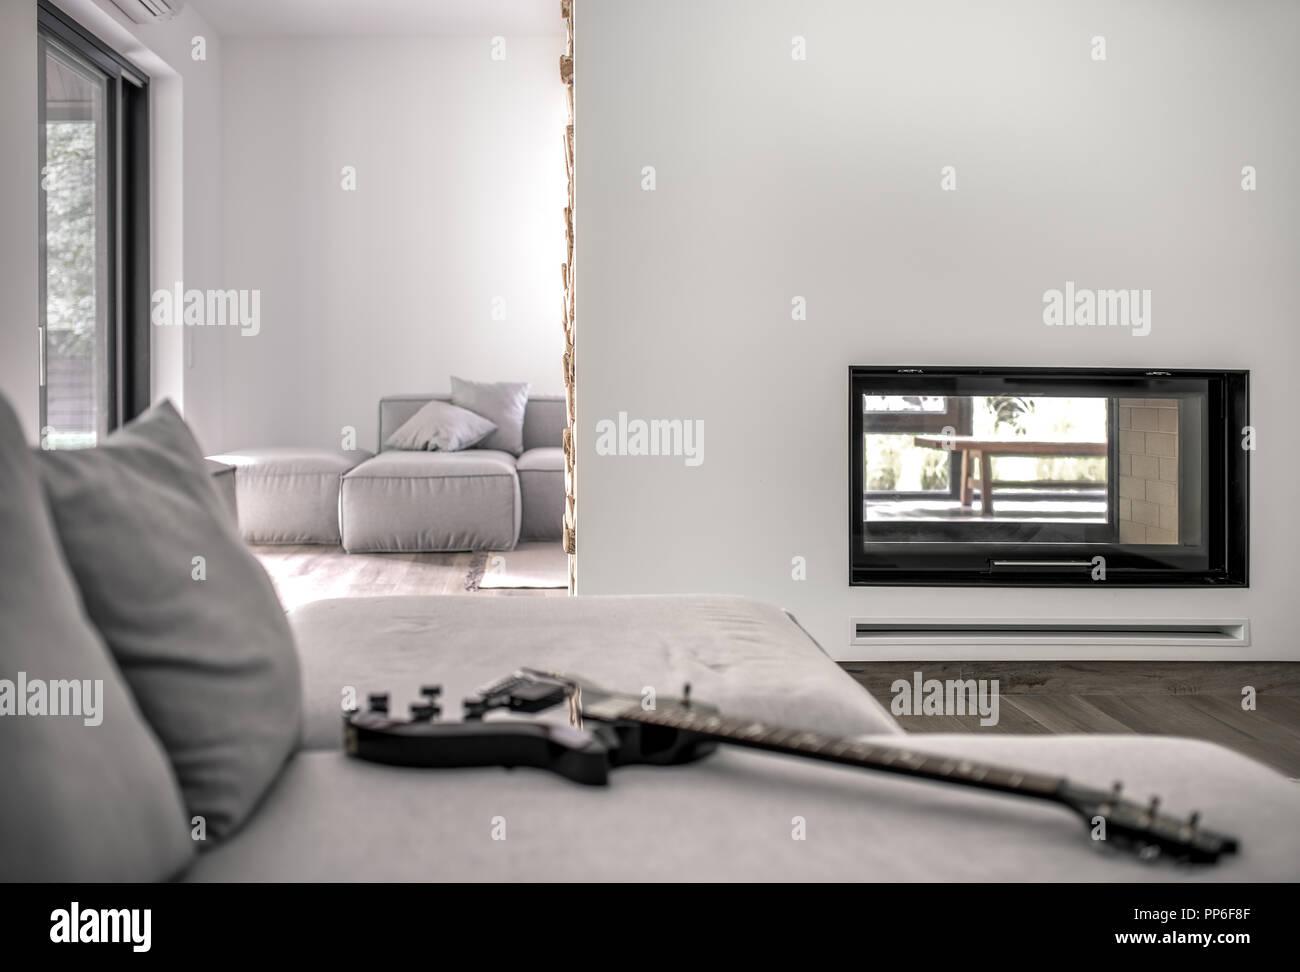 Arredamento Moderno Elegante : Elegante arredamento moderno dell appartamento u foto stock